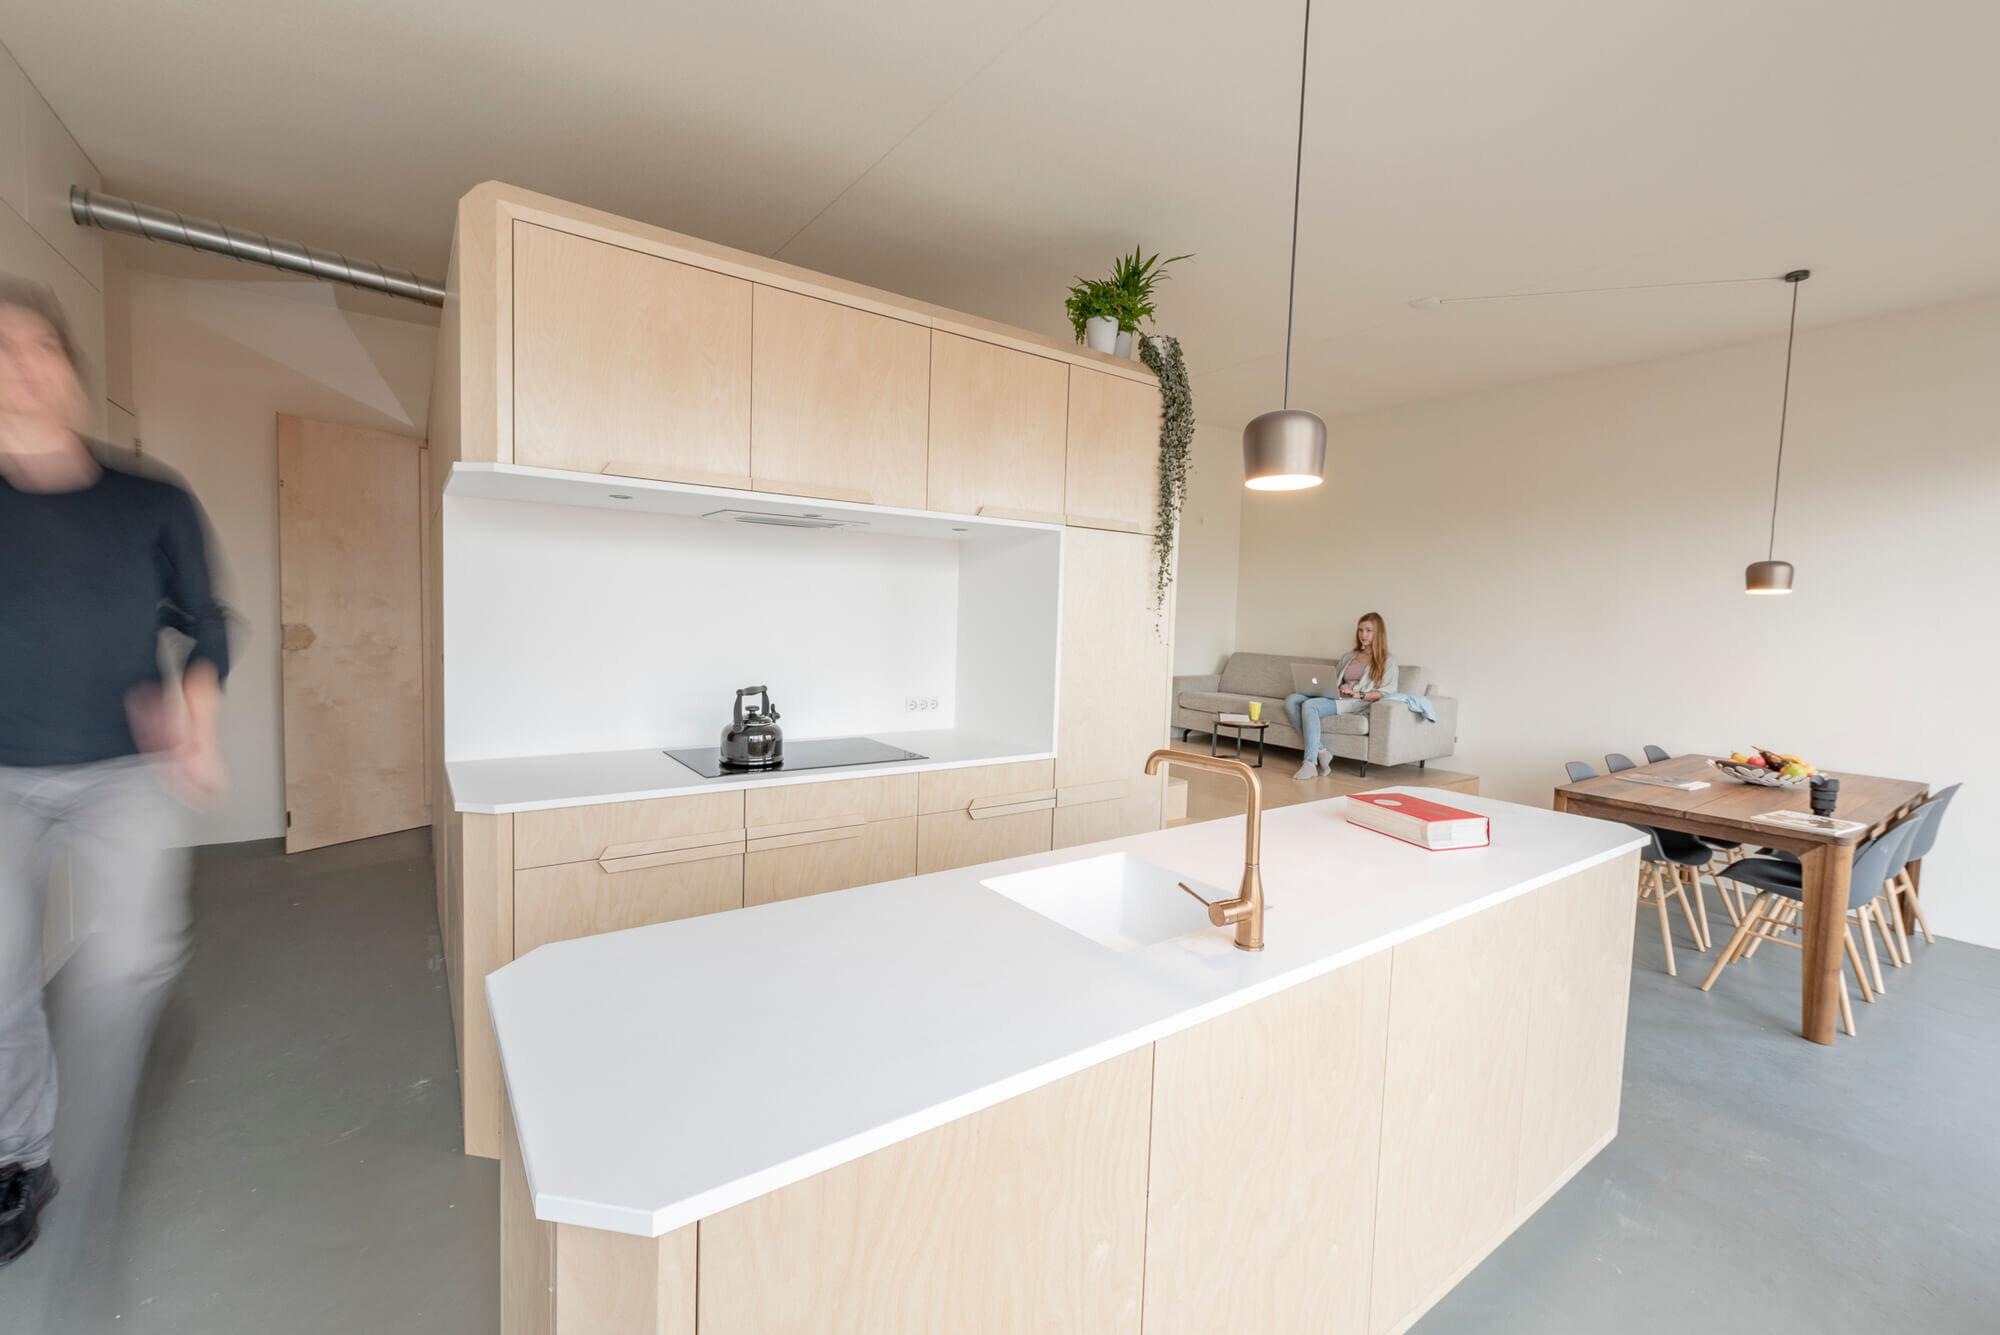 Loft-Buiksloterham-Heren-5-Architects-The-Netherlands-1